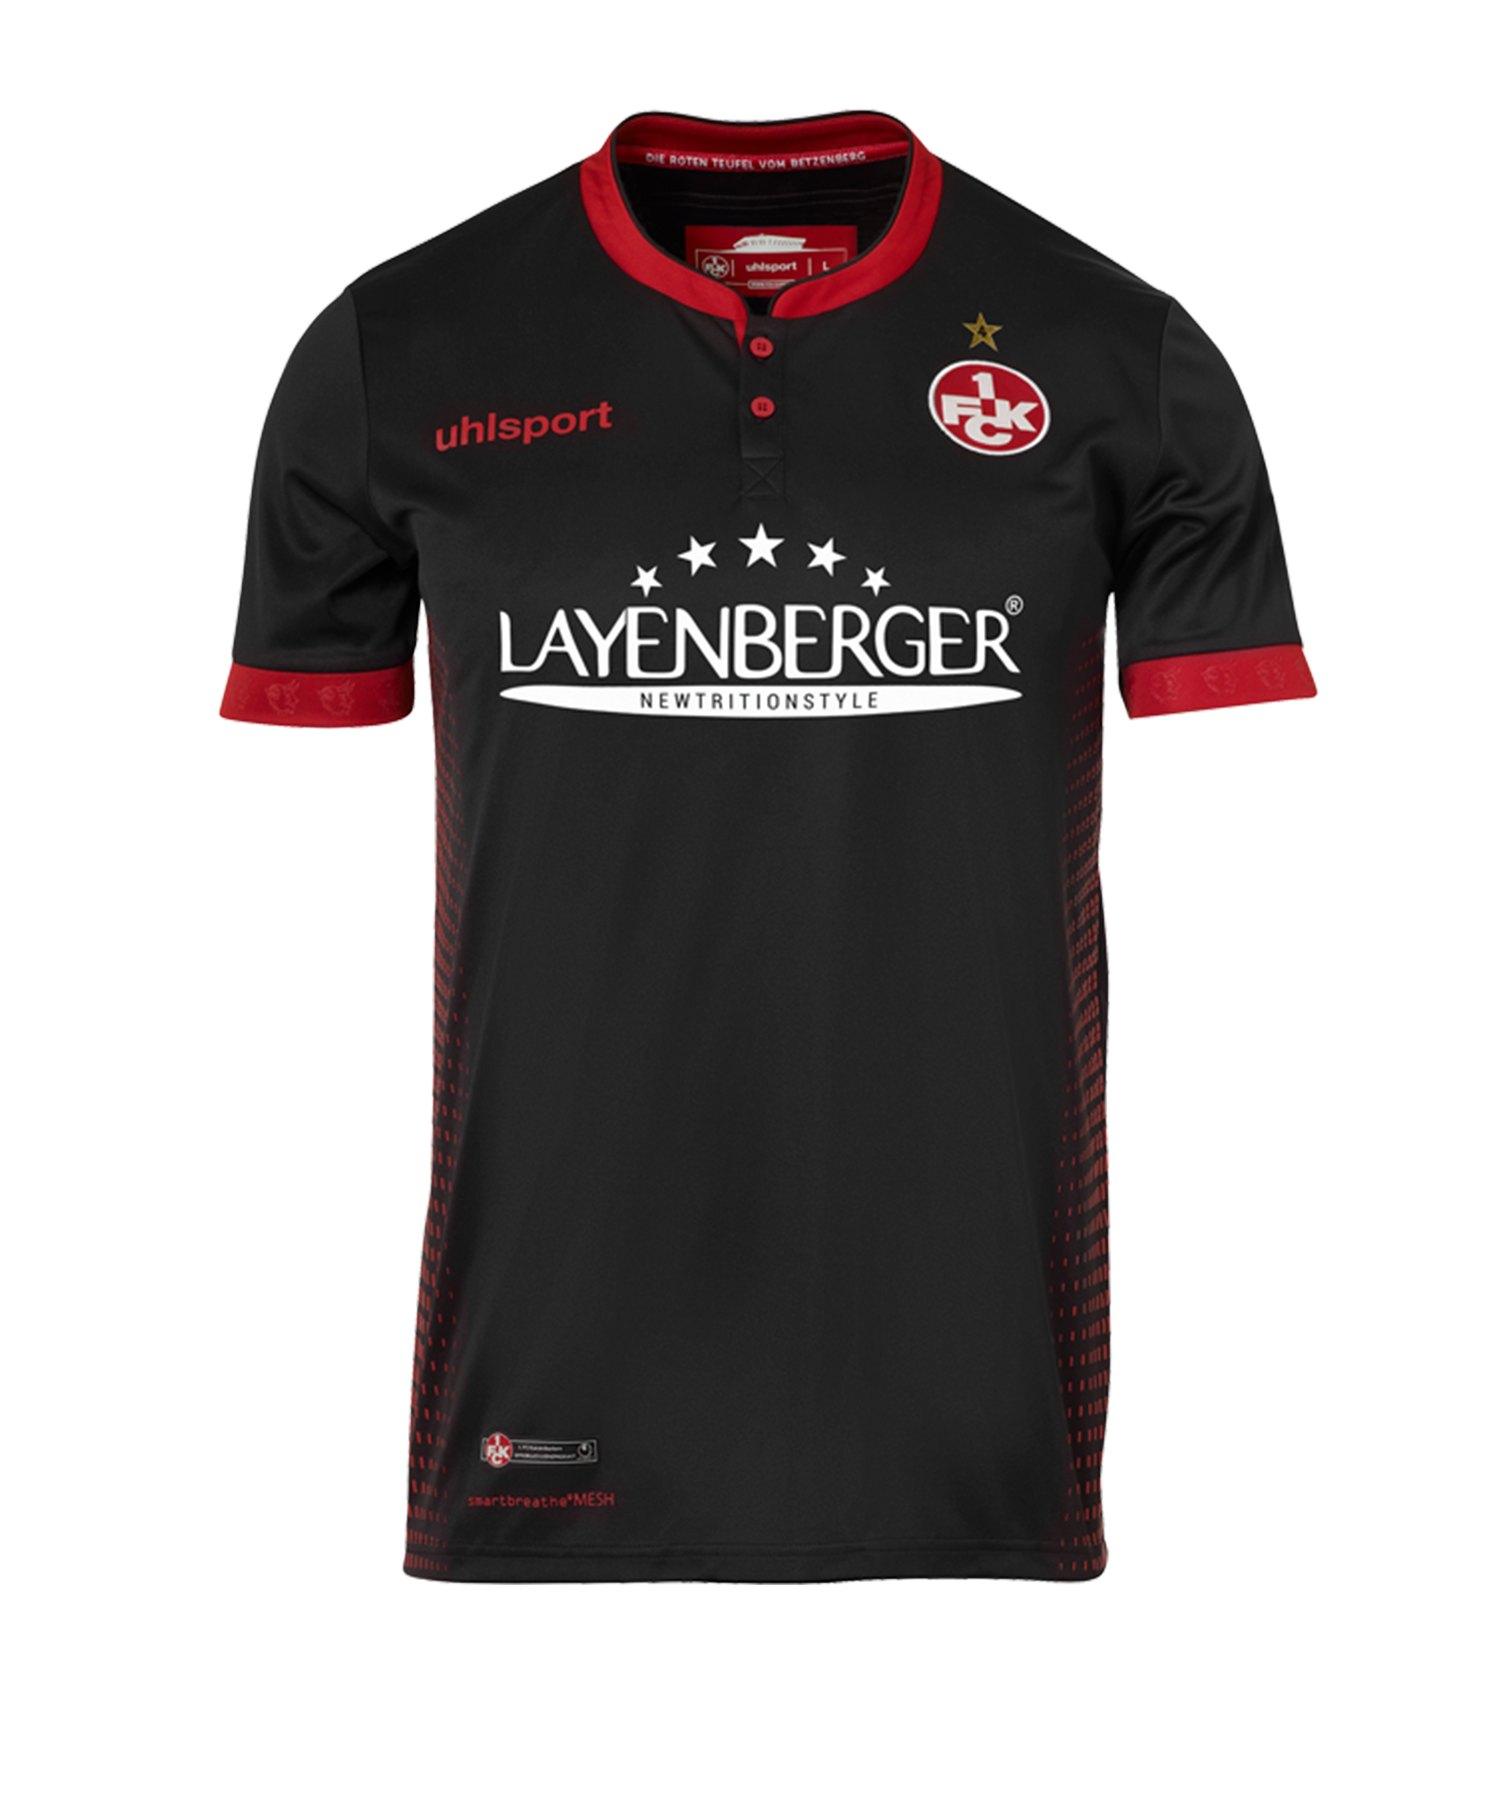 Uhlsport 1. FC Kaiserslautern Trikot Away 2018/19 - schwarz